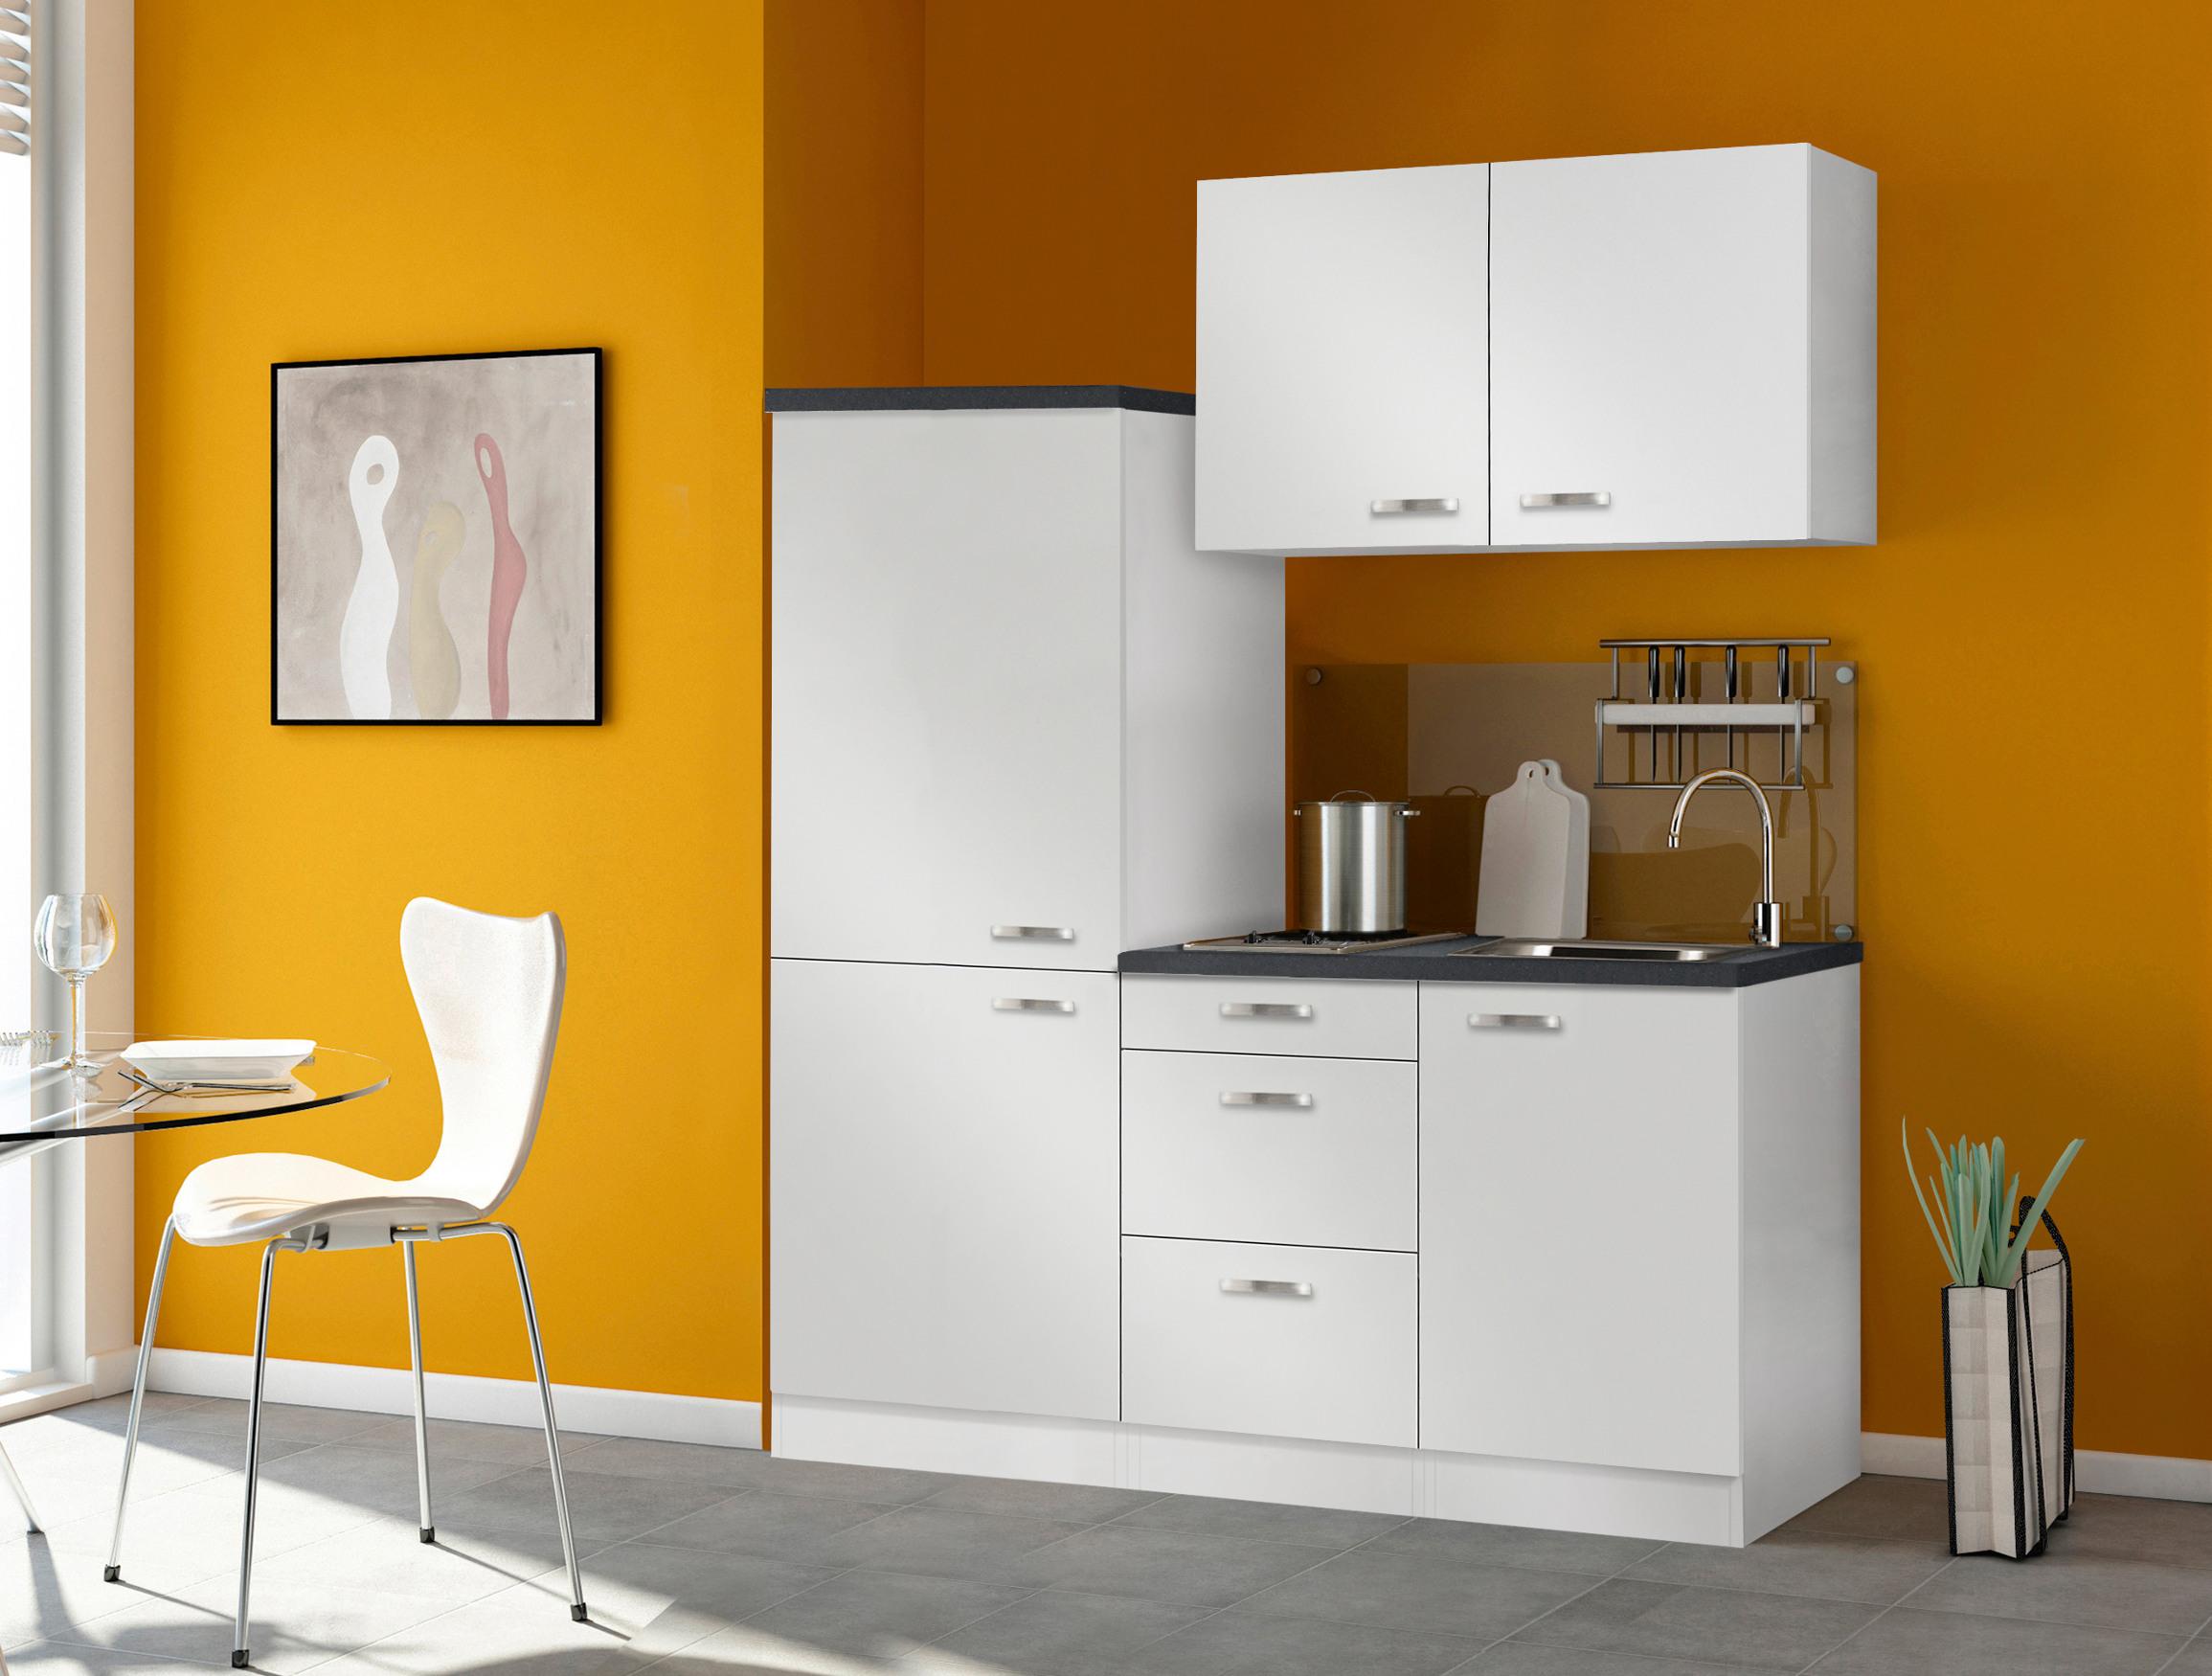 singlek che granada mit glaskeramik kochfeld breite 160 cm wei k che singlek chen. Black Bedroom Furniture Sets. Home Design Ideas